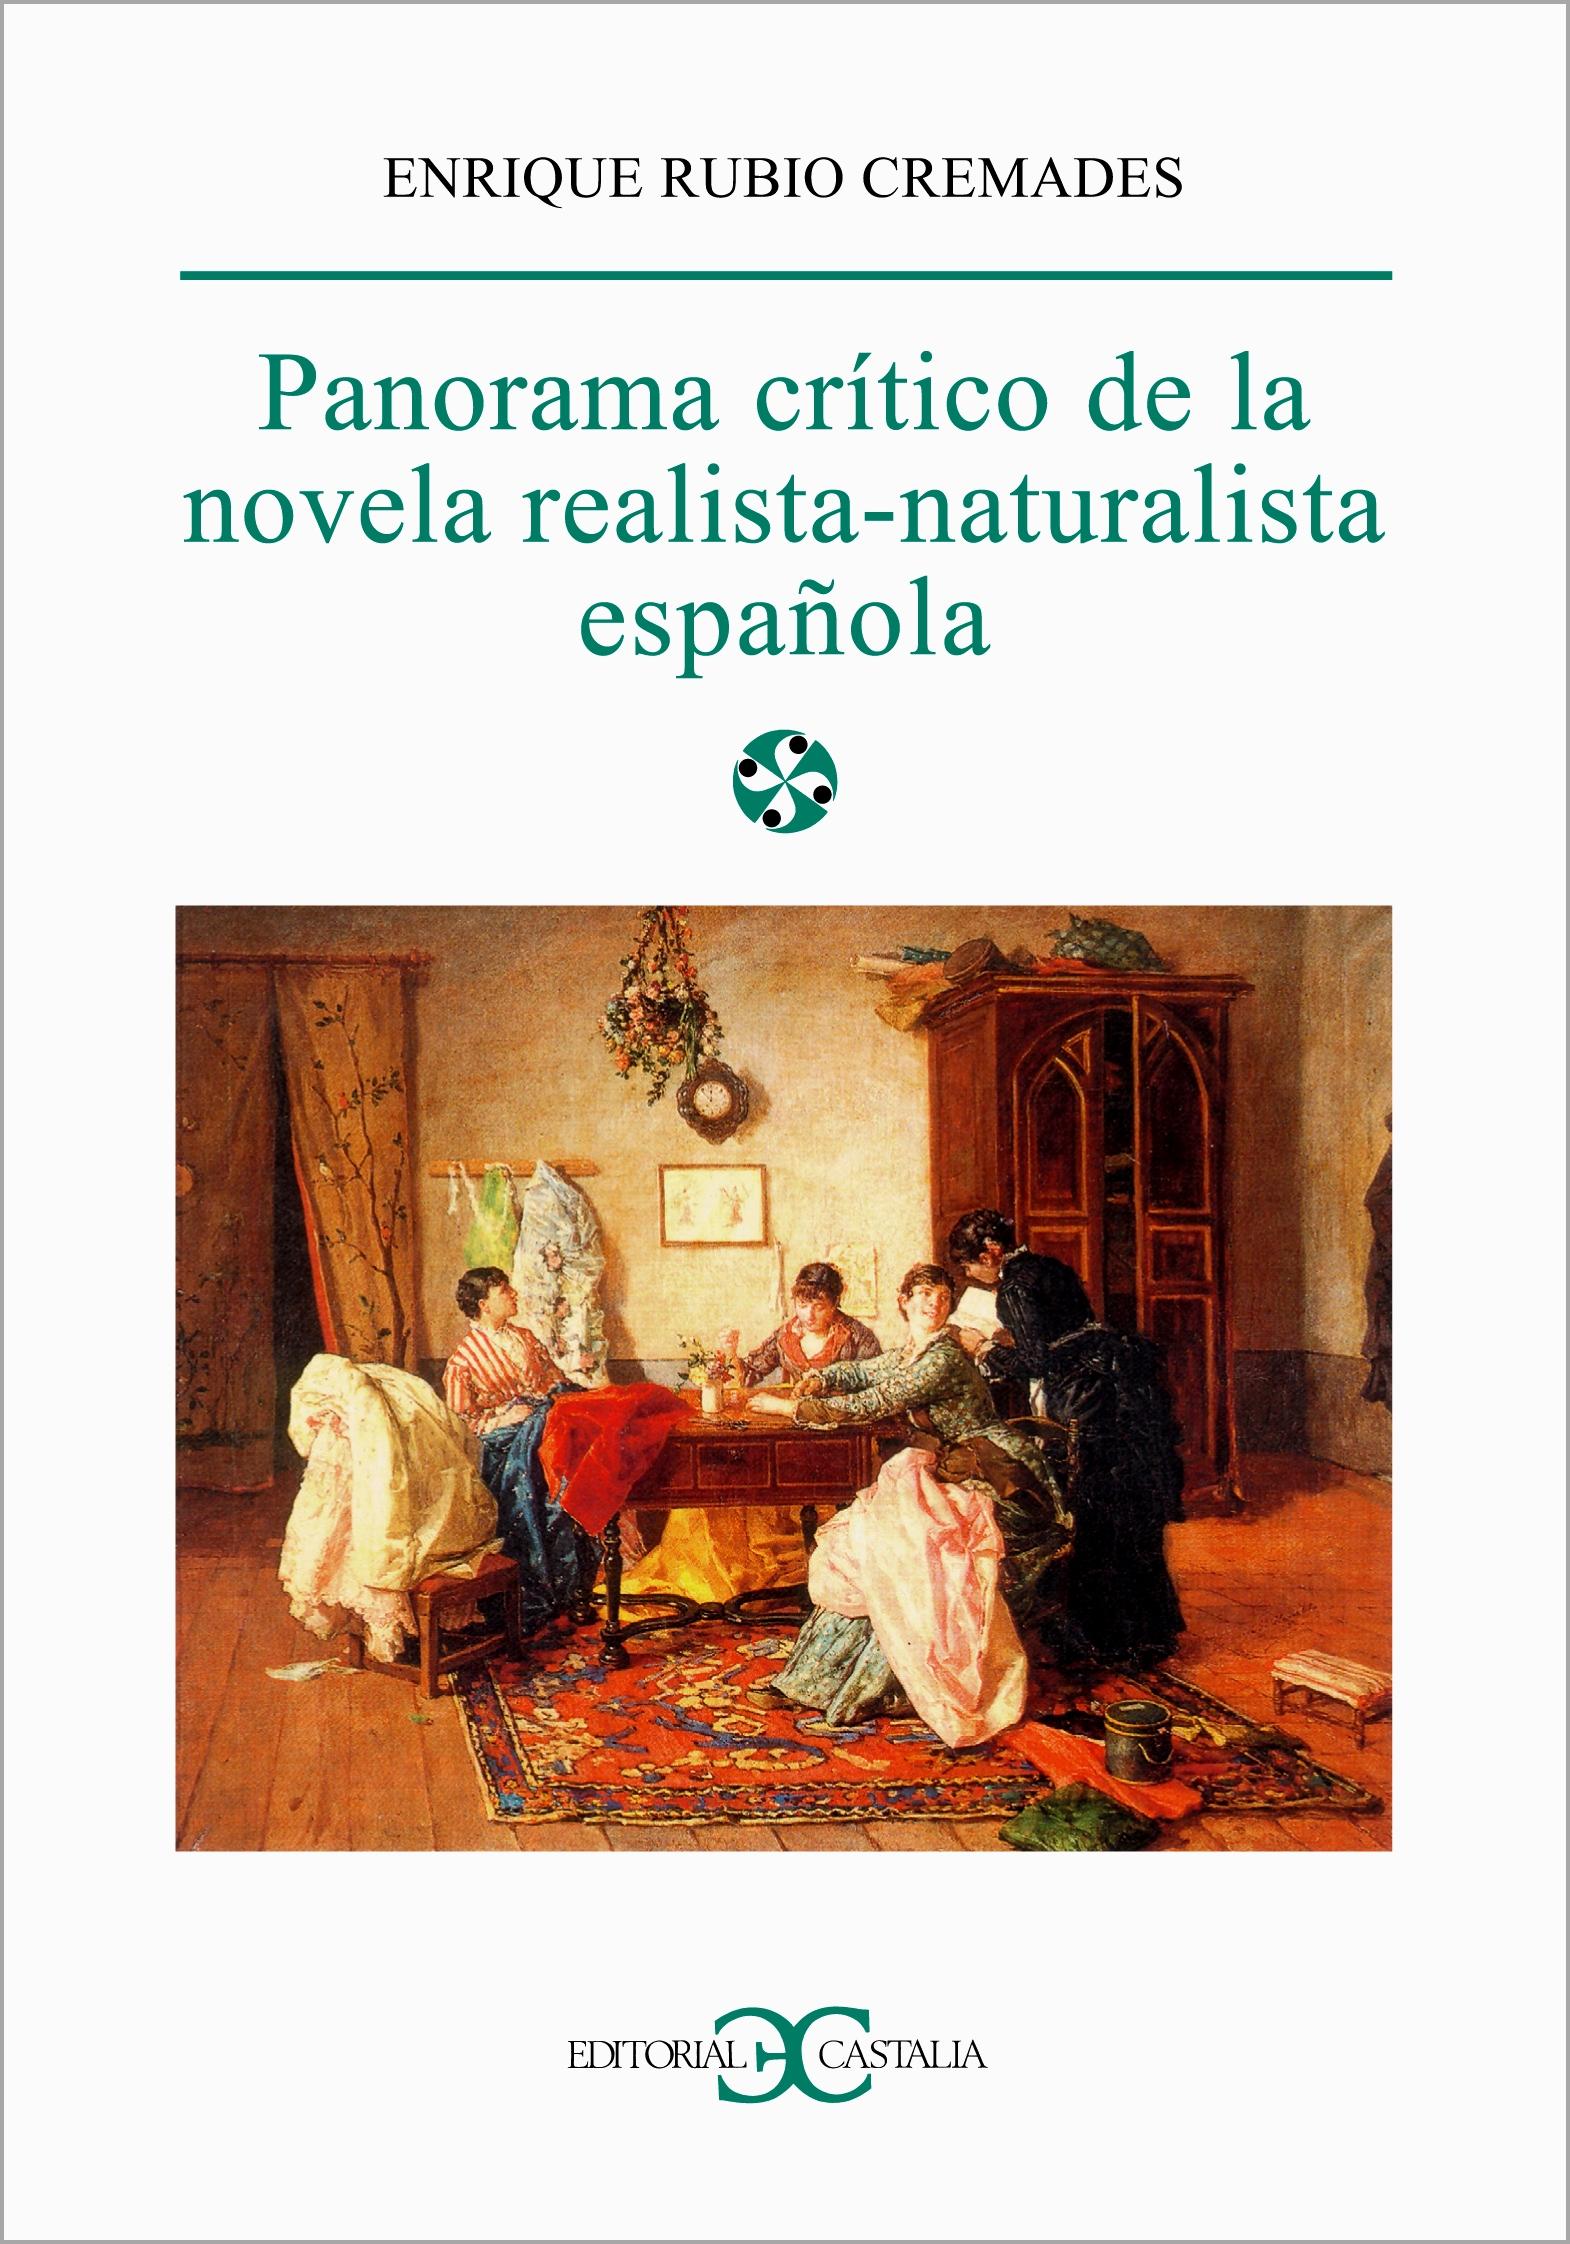 Panorama crítico de la novela realista-naturalista española